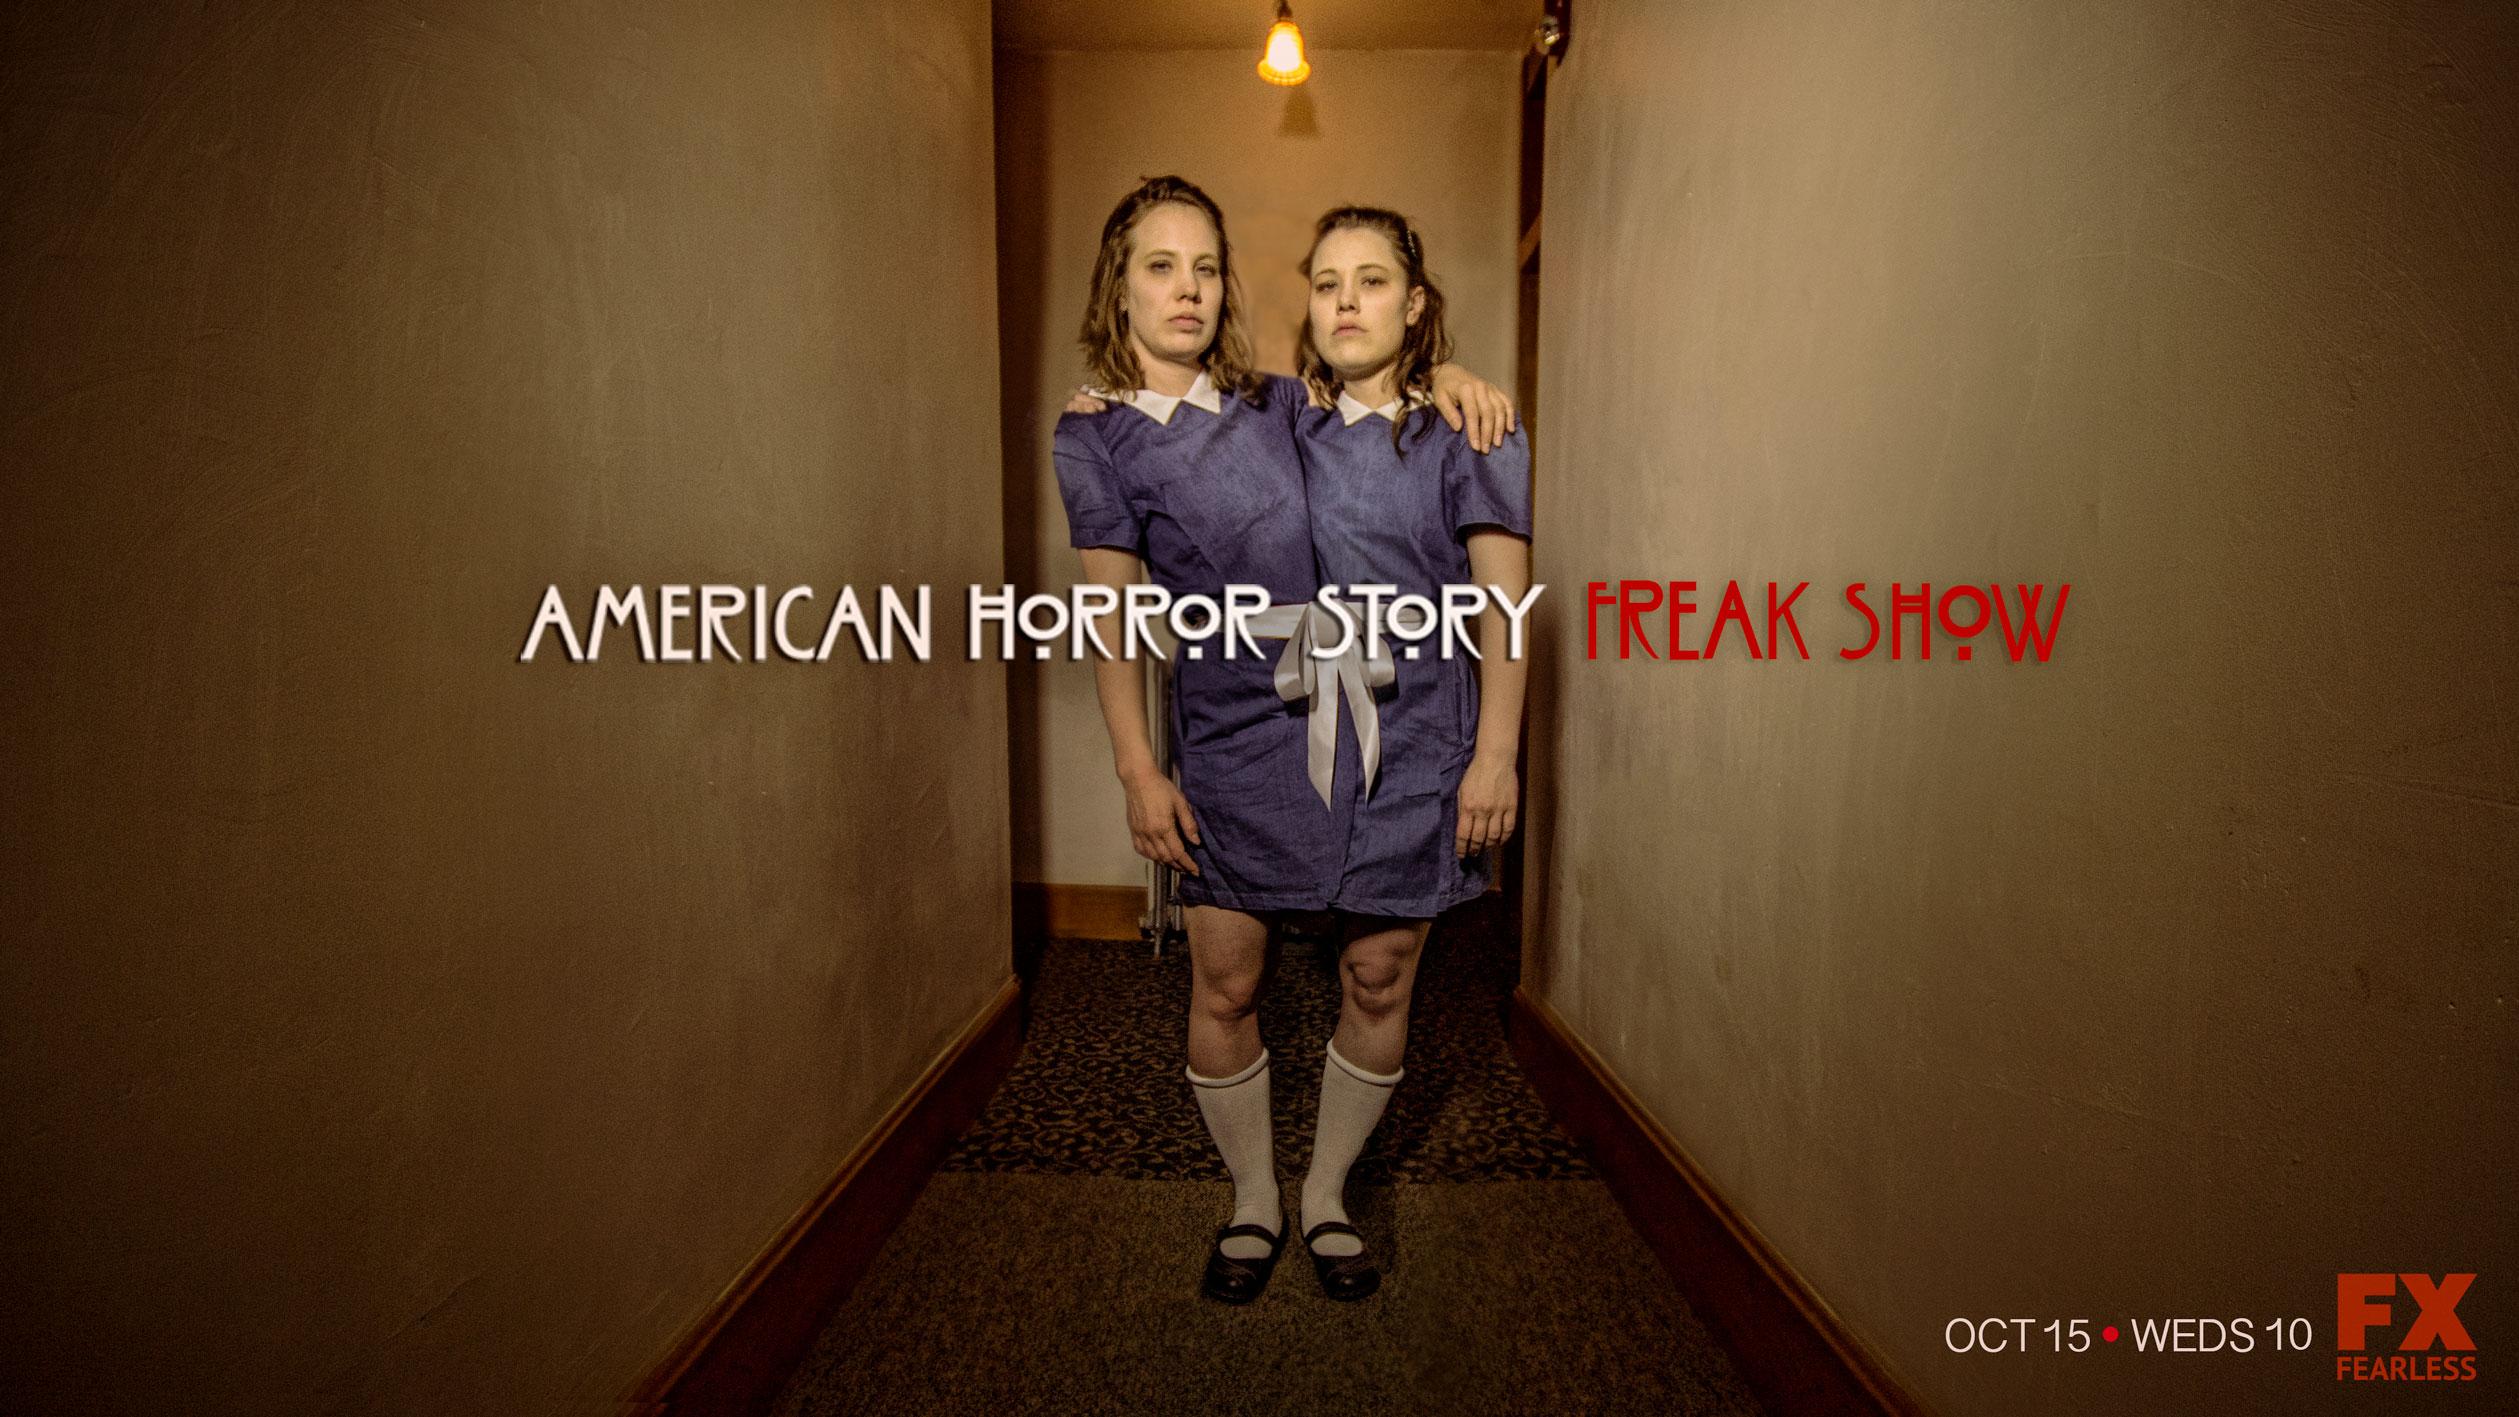 ahs - American Horror Story: Freak Show Gets Renewal